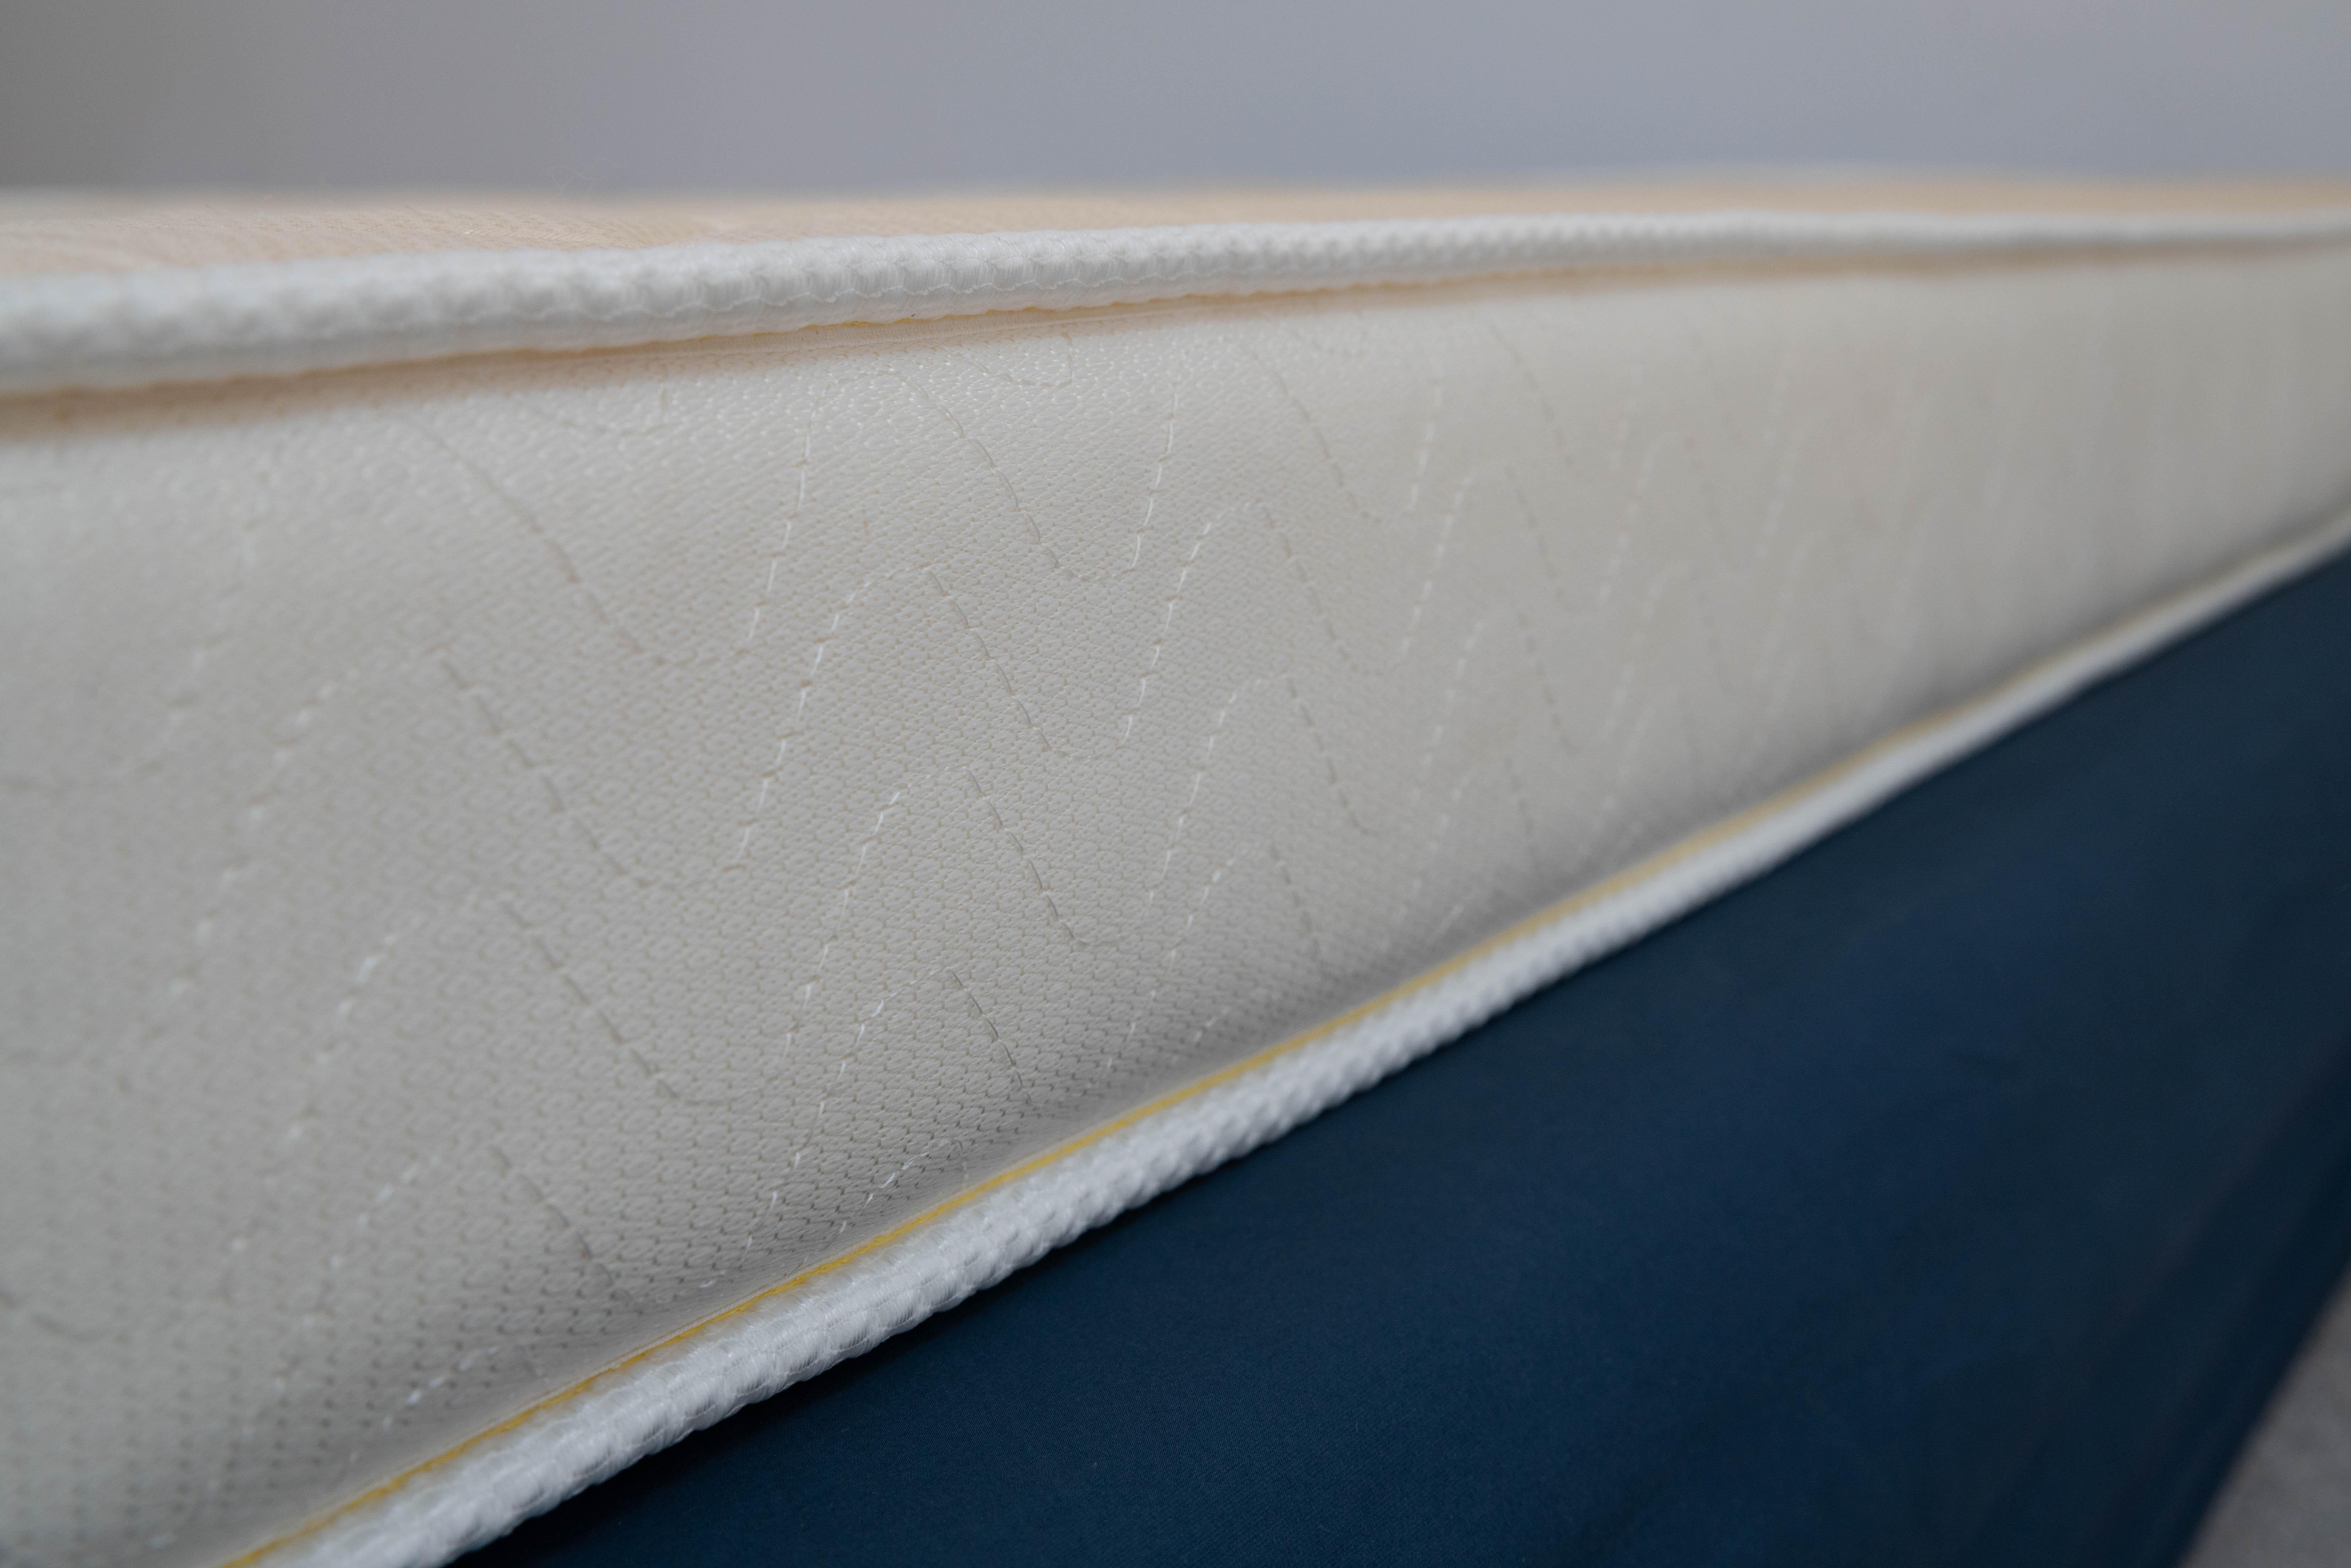 5 inch replacement mattress